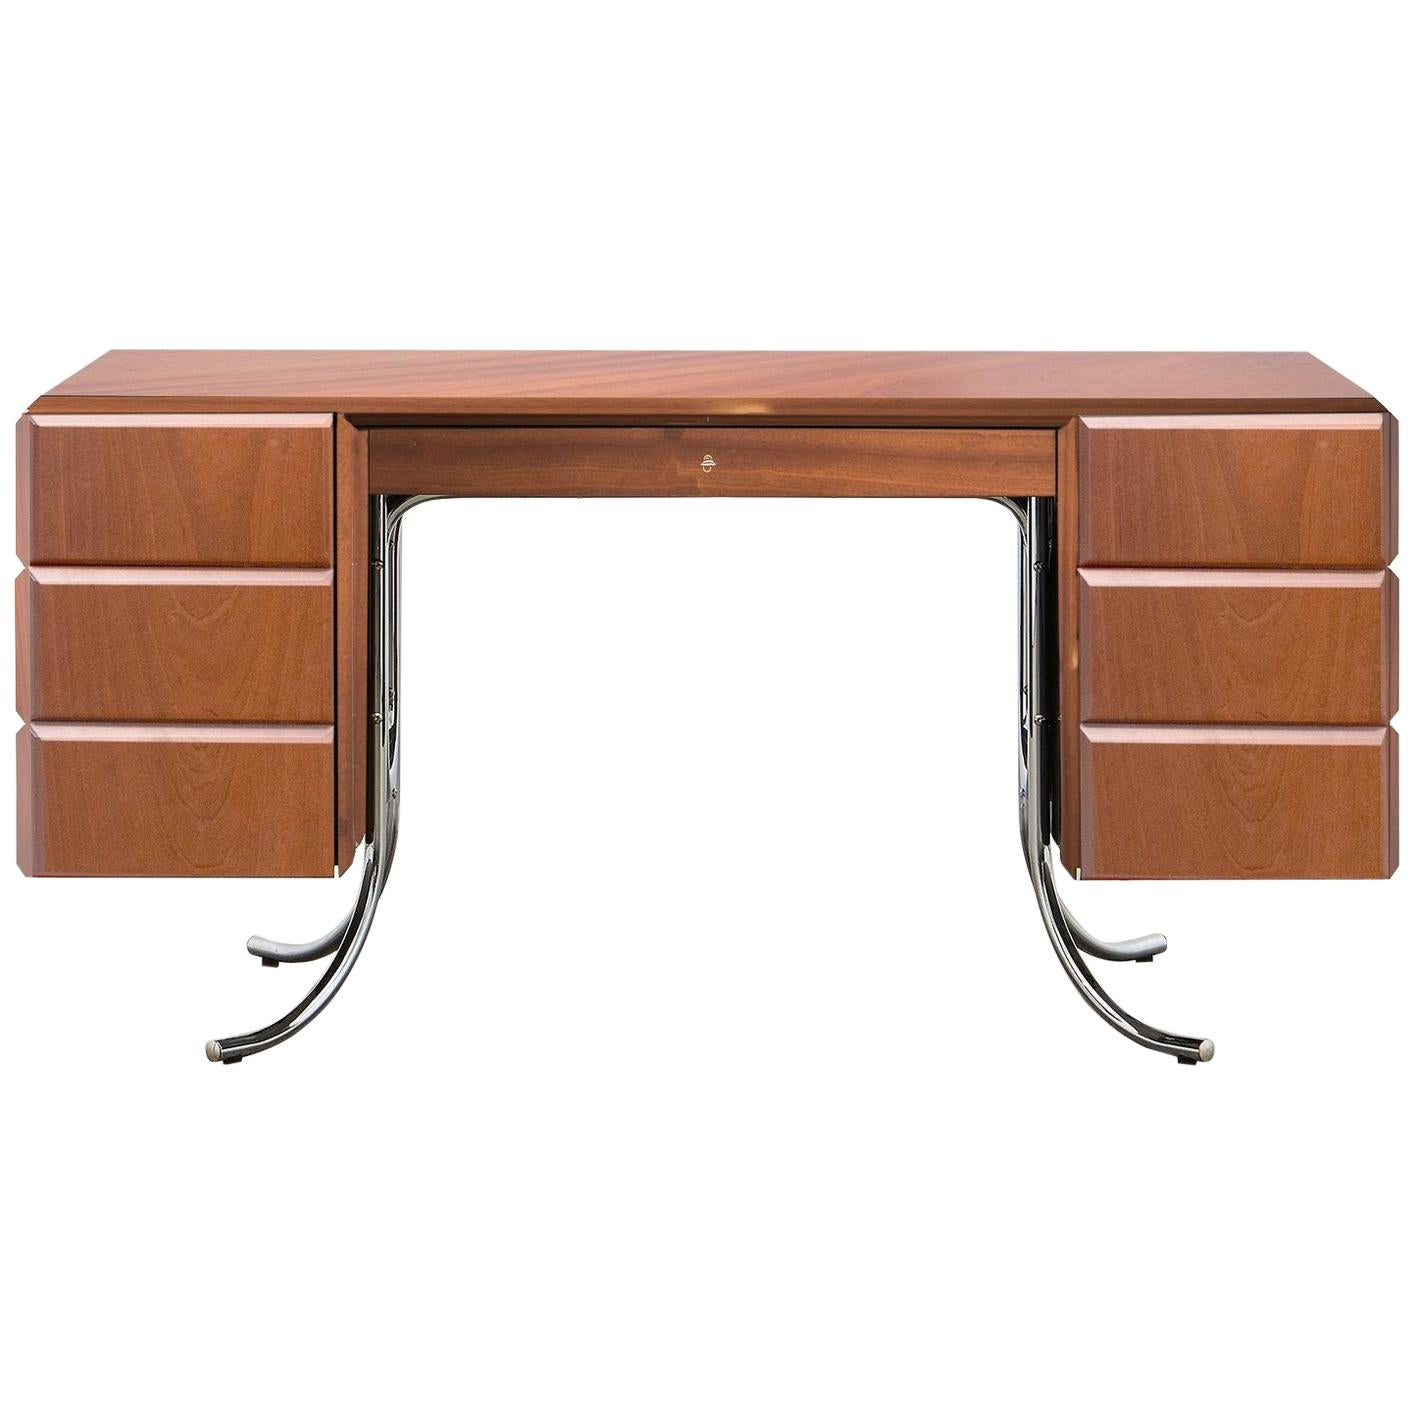 PH Office Desk, Chrome, Mahogany Venee, Red Satin Matt, Solid Wood Edges